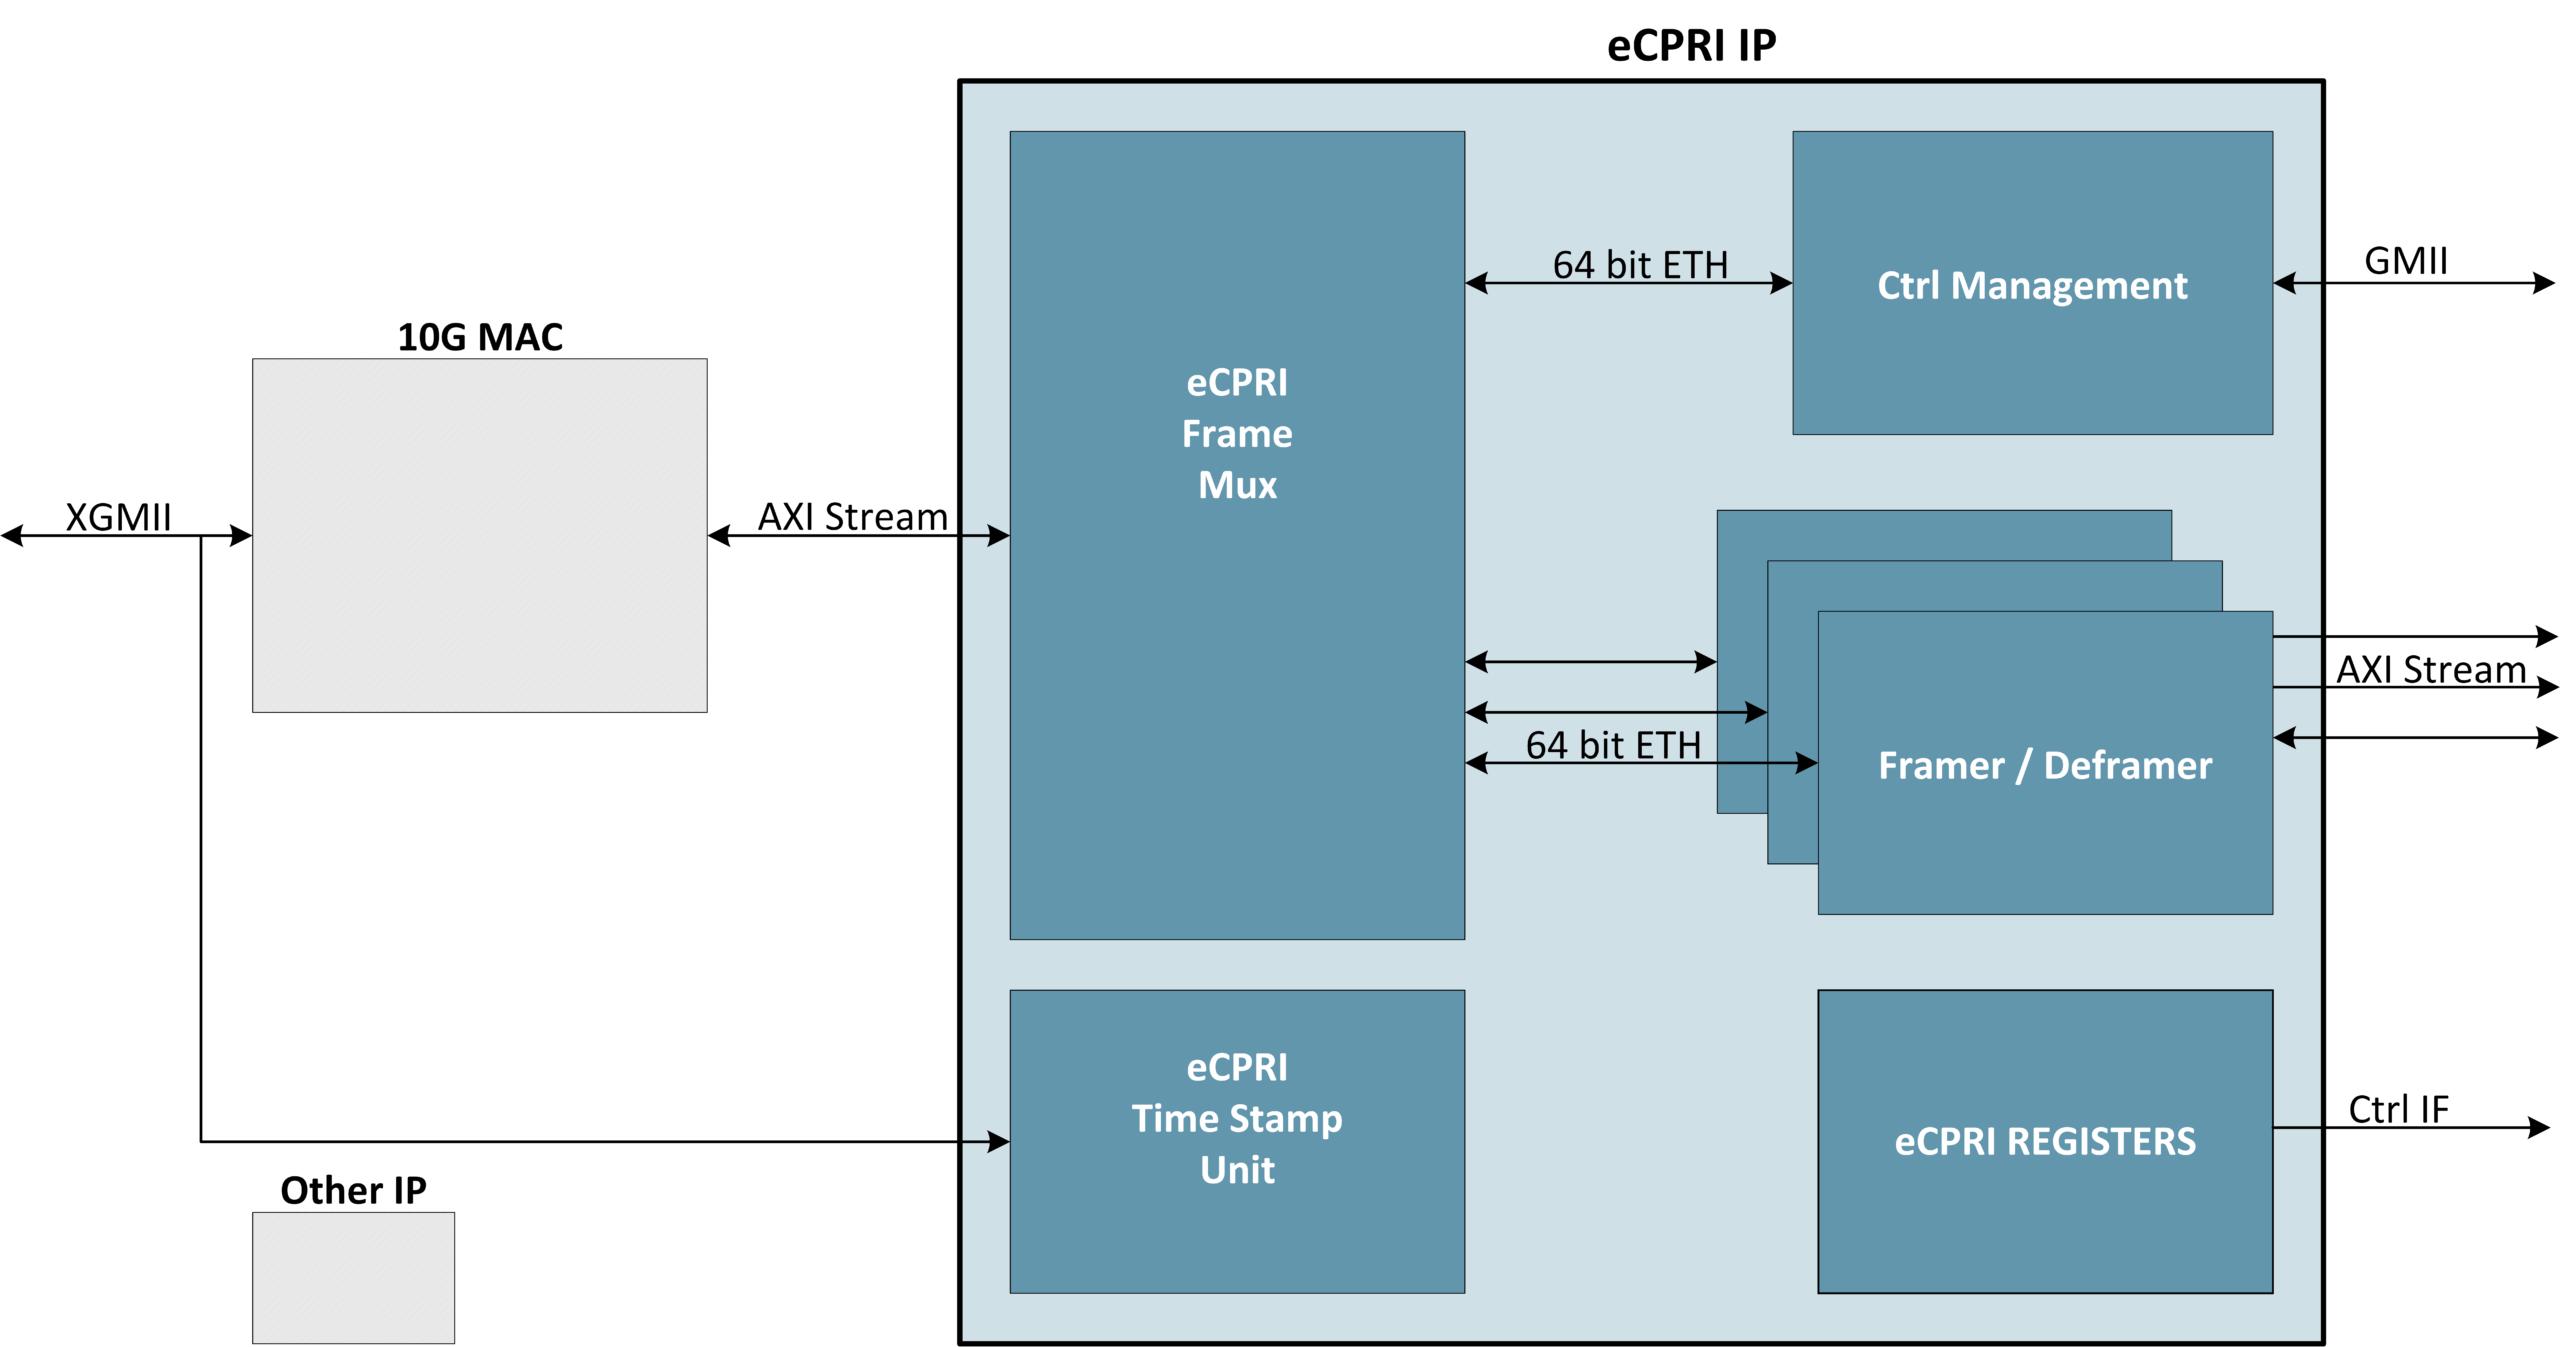 eCPRI Split 8 Block Diagram